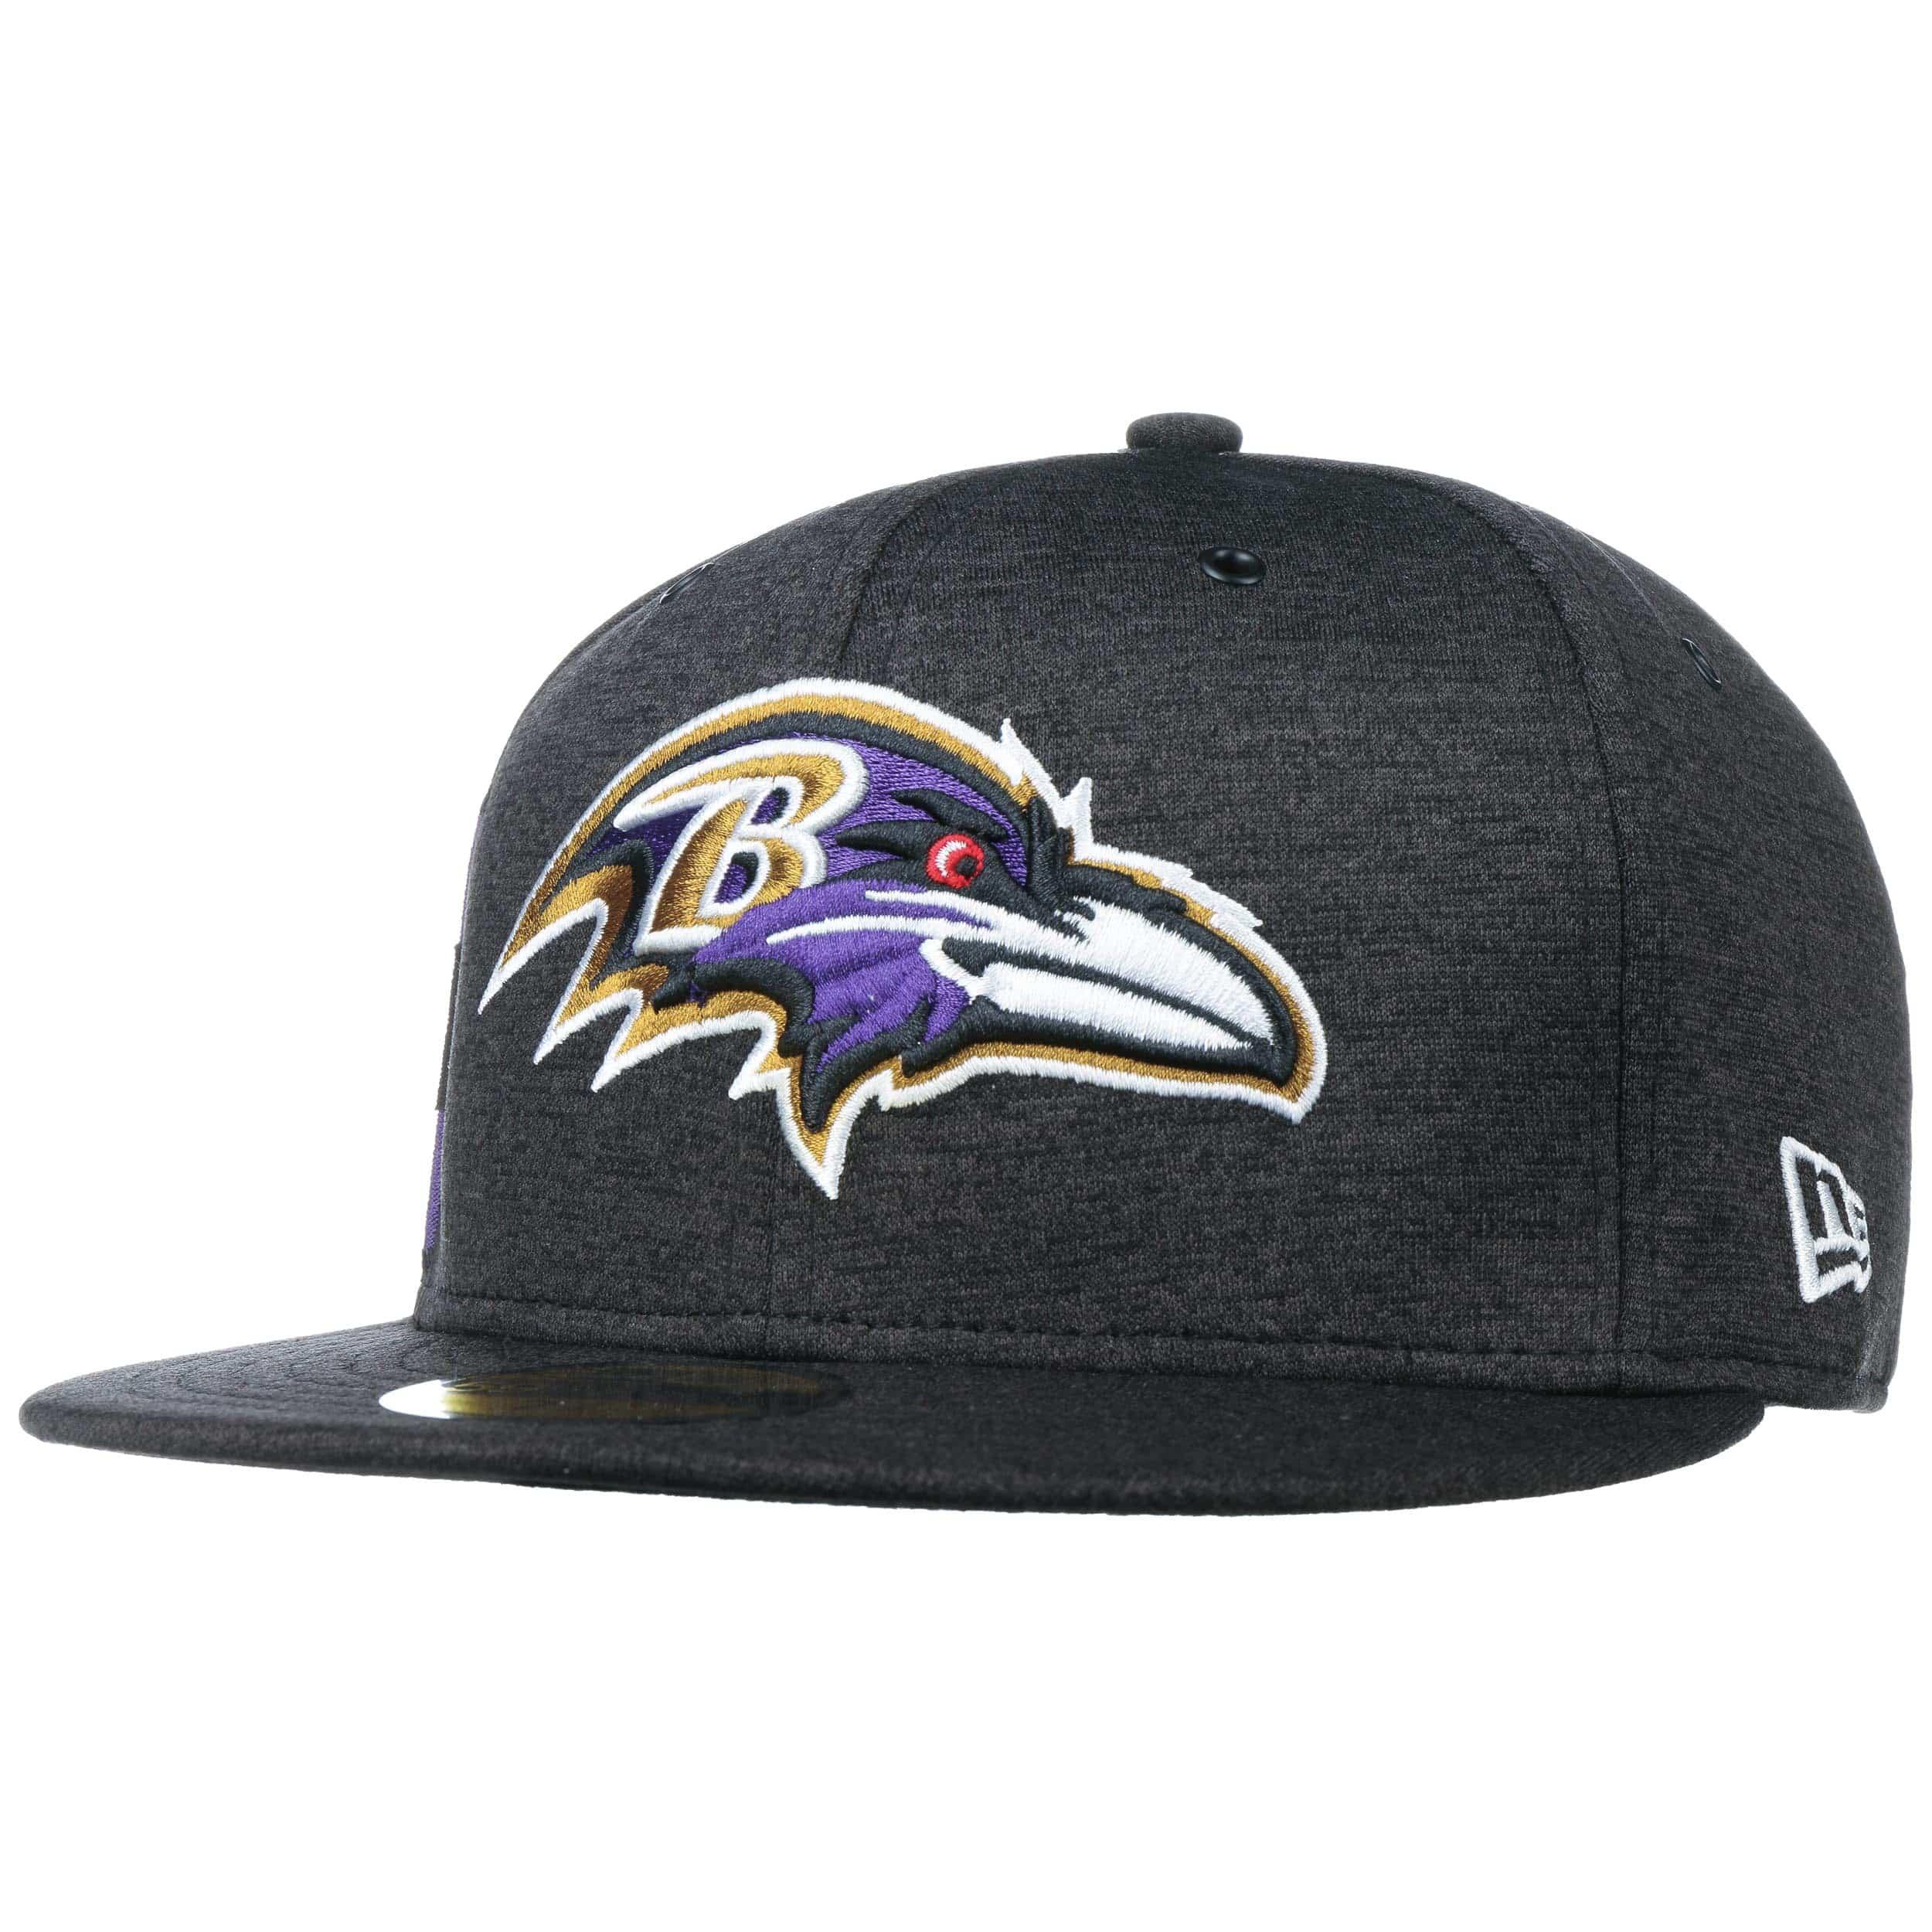 aafc2e607d5 59Fifty On-Field 18 Ravens Cap by New Era